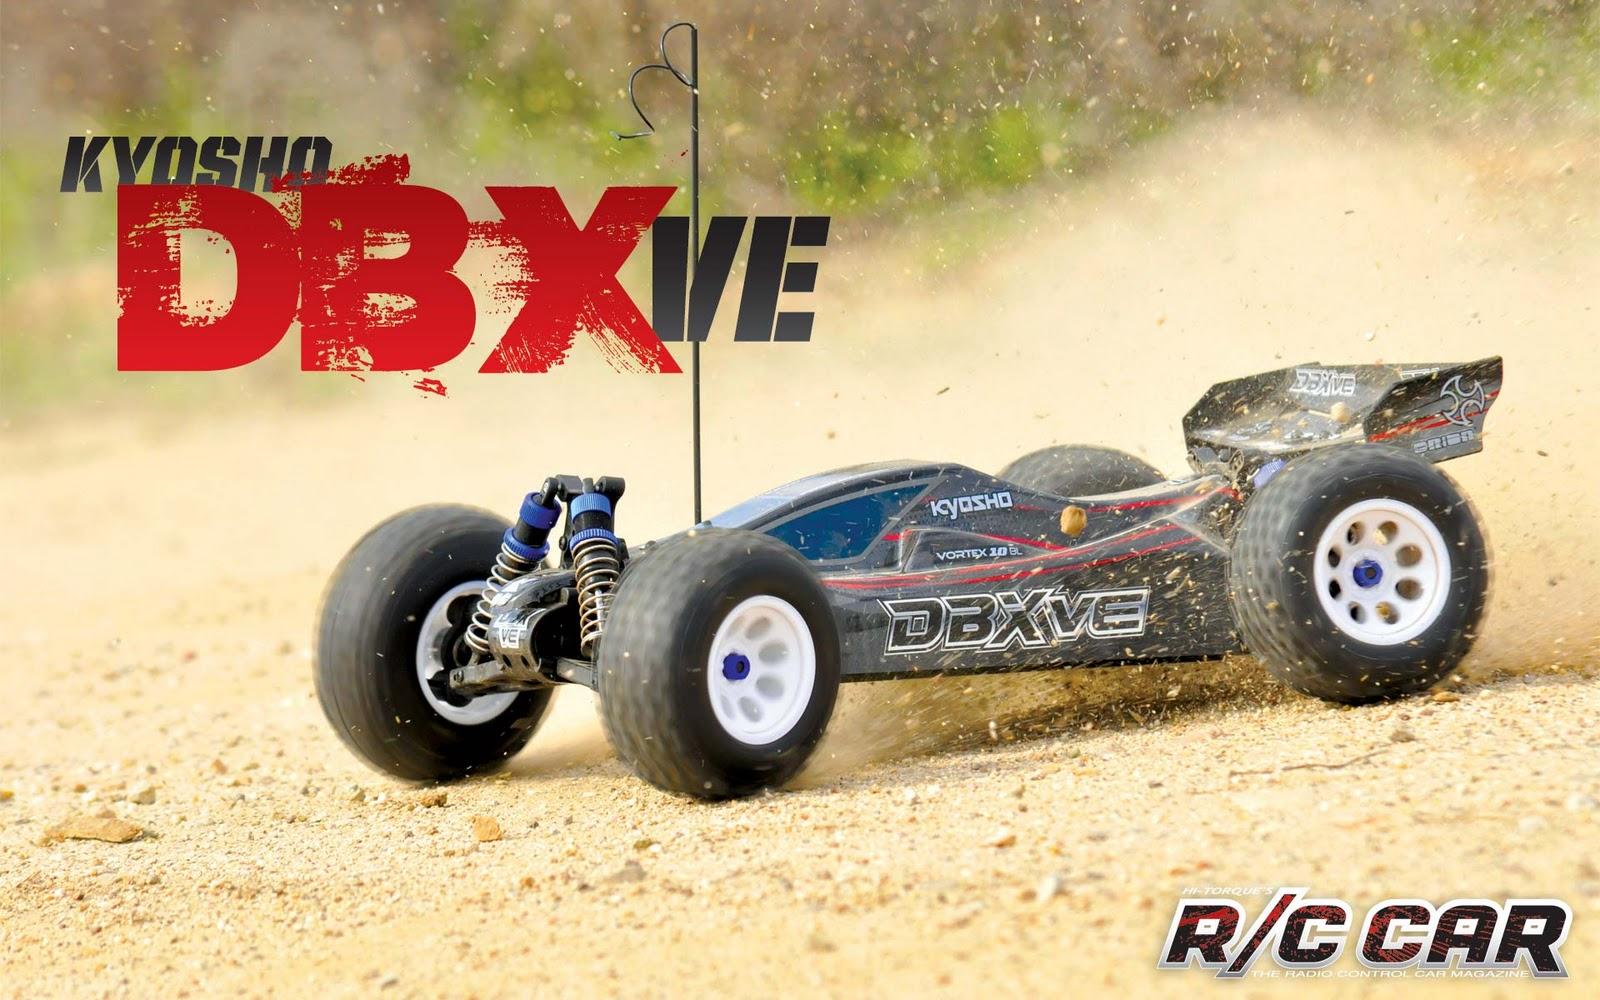 http://3.bp.blogspot.com/__ZTYagFP2f8/TR9aoopyxdI/AAAAAAAAAoU/qWuMjcfLuzw/s1600/KYOSHO+DBX+VE+RC+CAR.jpg